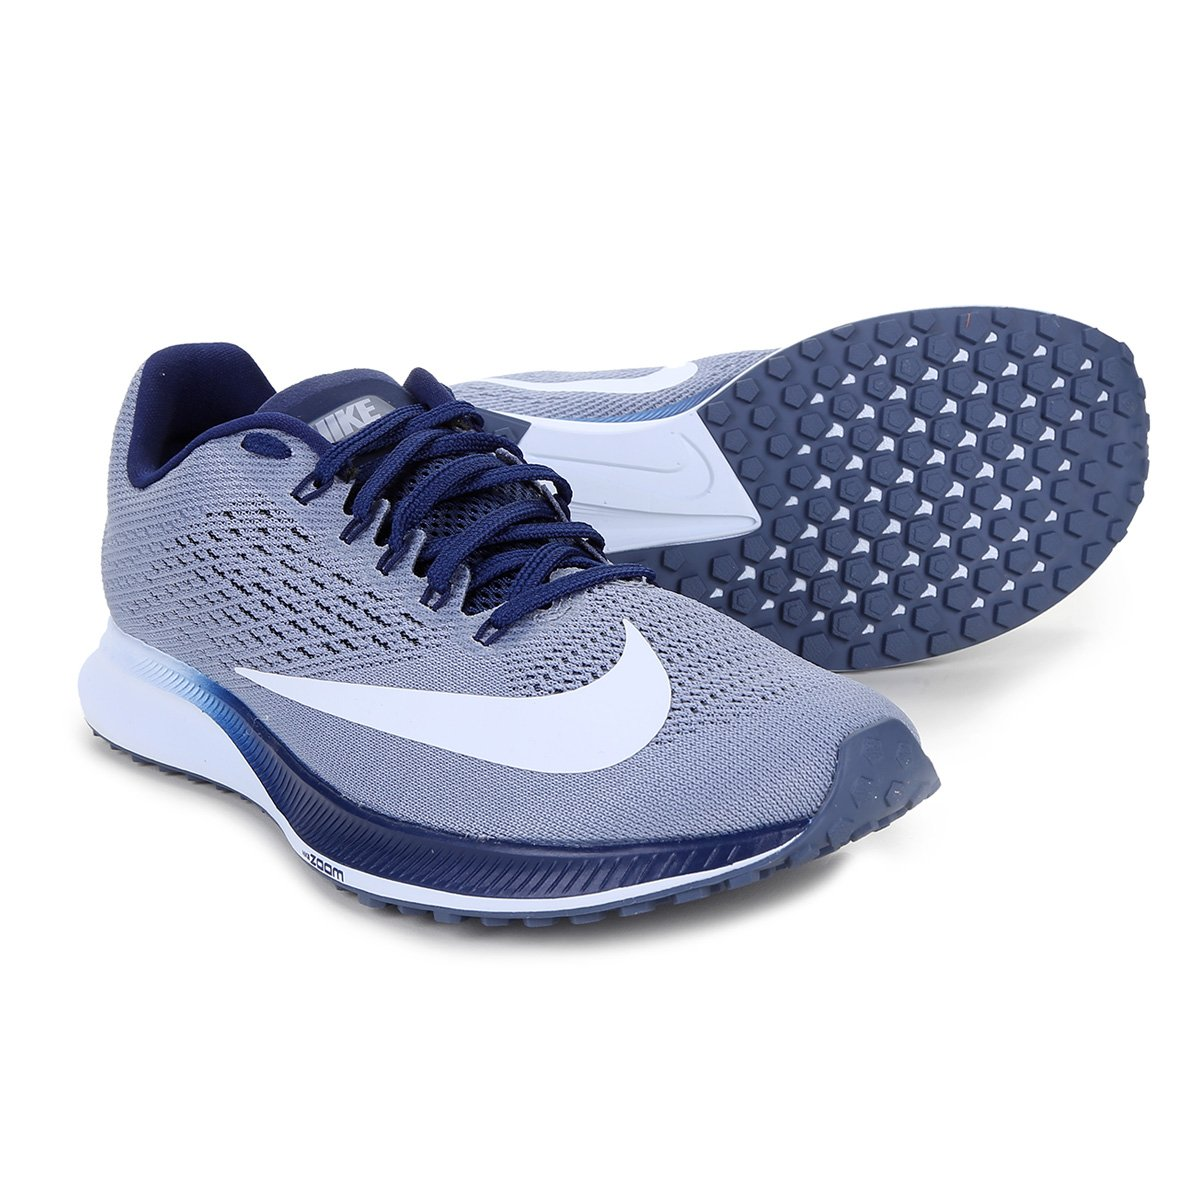 9c6e891bd75 Tênis Nike Air Zoom Elite 10 Masculino - Cinza e Azul - Compre Agora ...